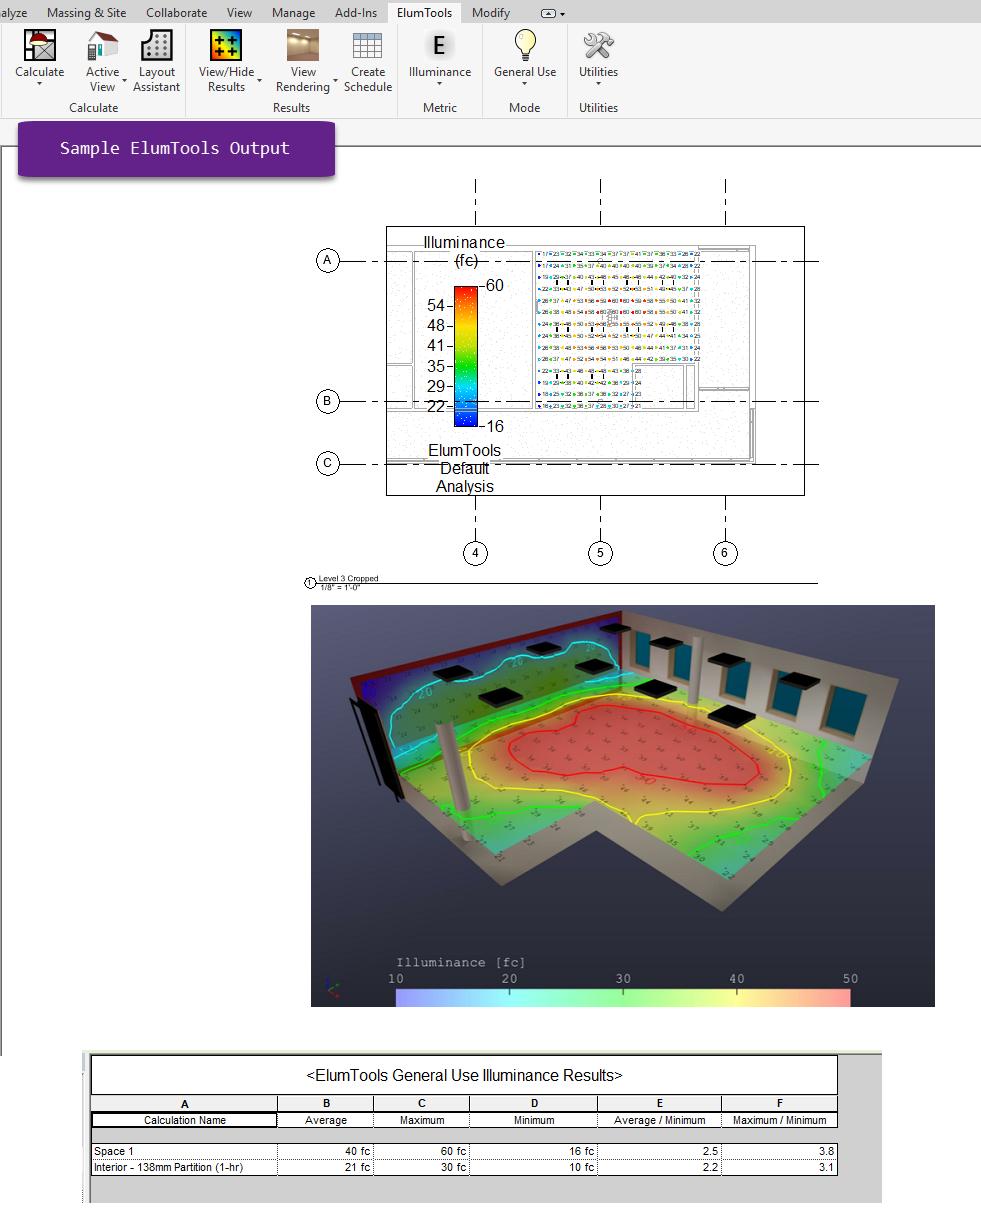 Lighting in ElumTools vs  Lighting in Revit | Lighting Analysts